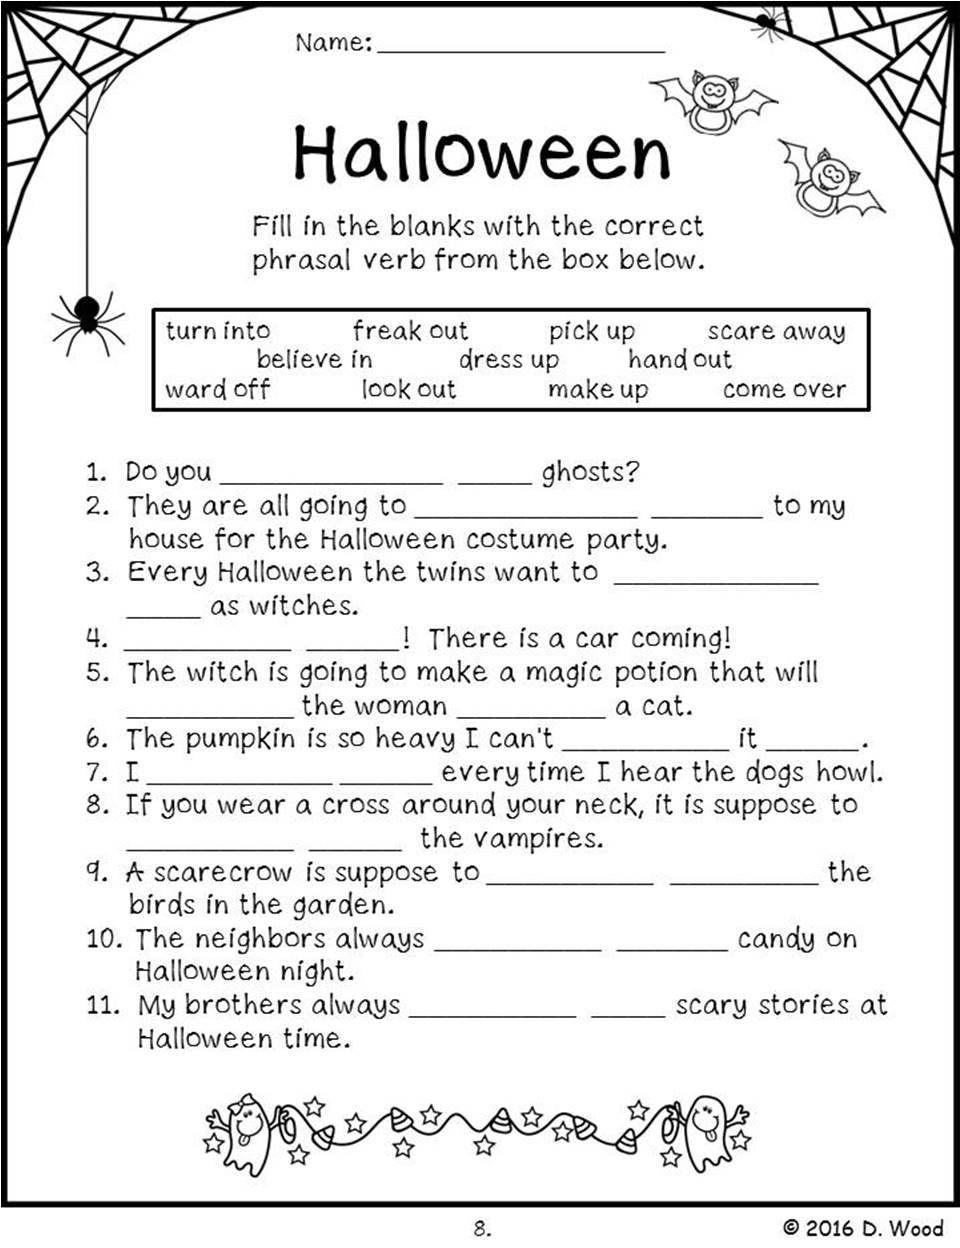 Halloween Language Arts Worksheets Halloween Reading In 2020